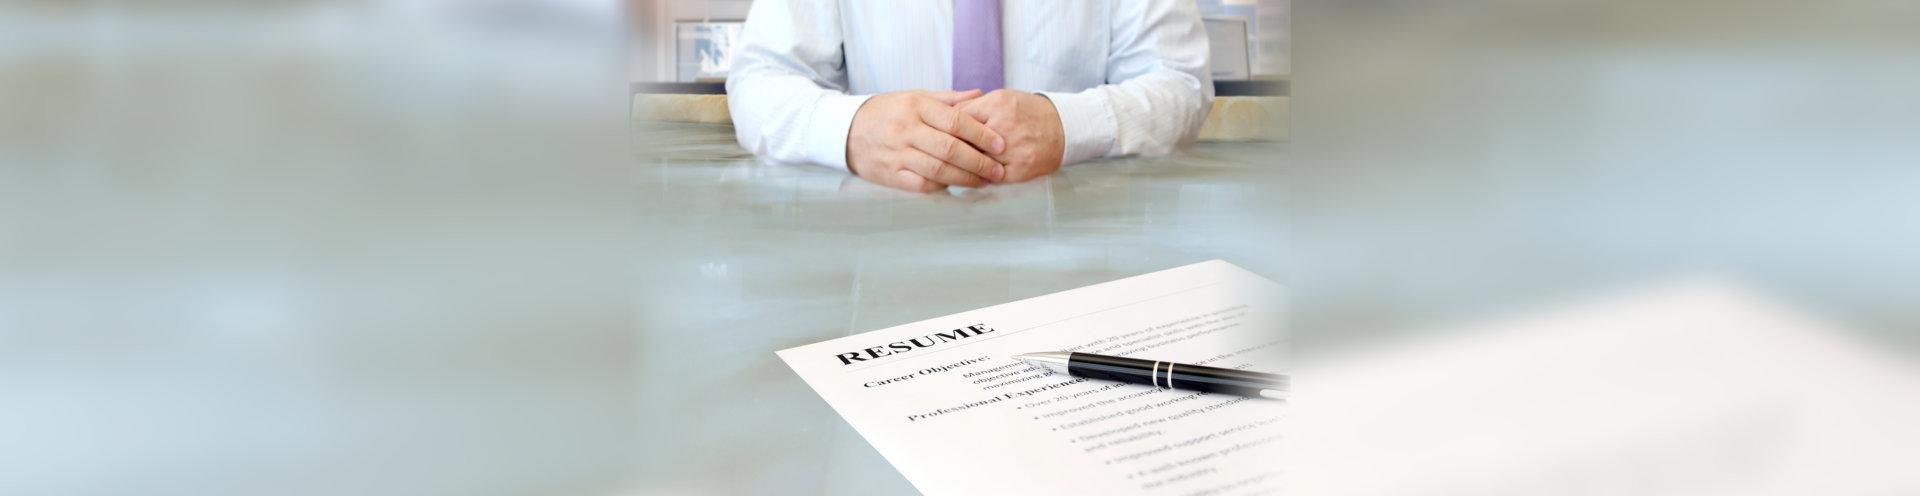 man applying for a job